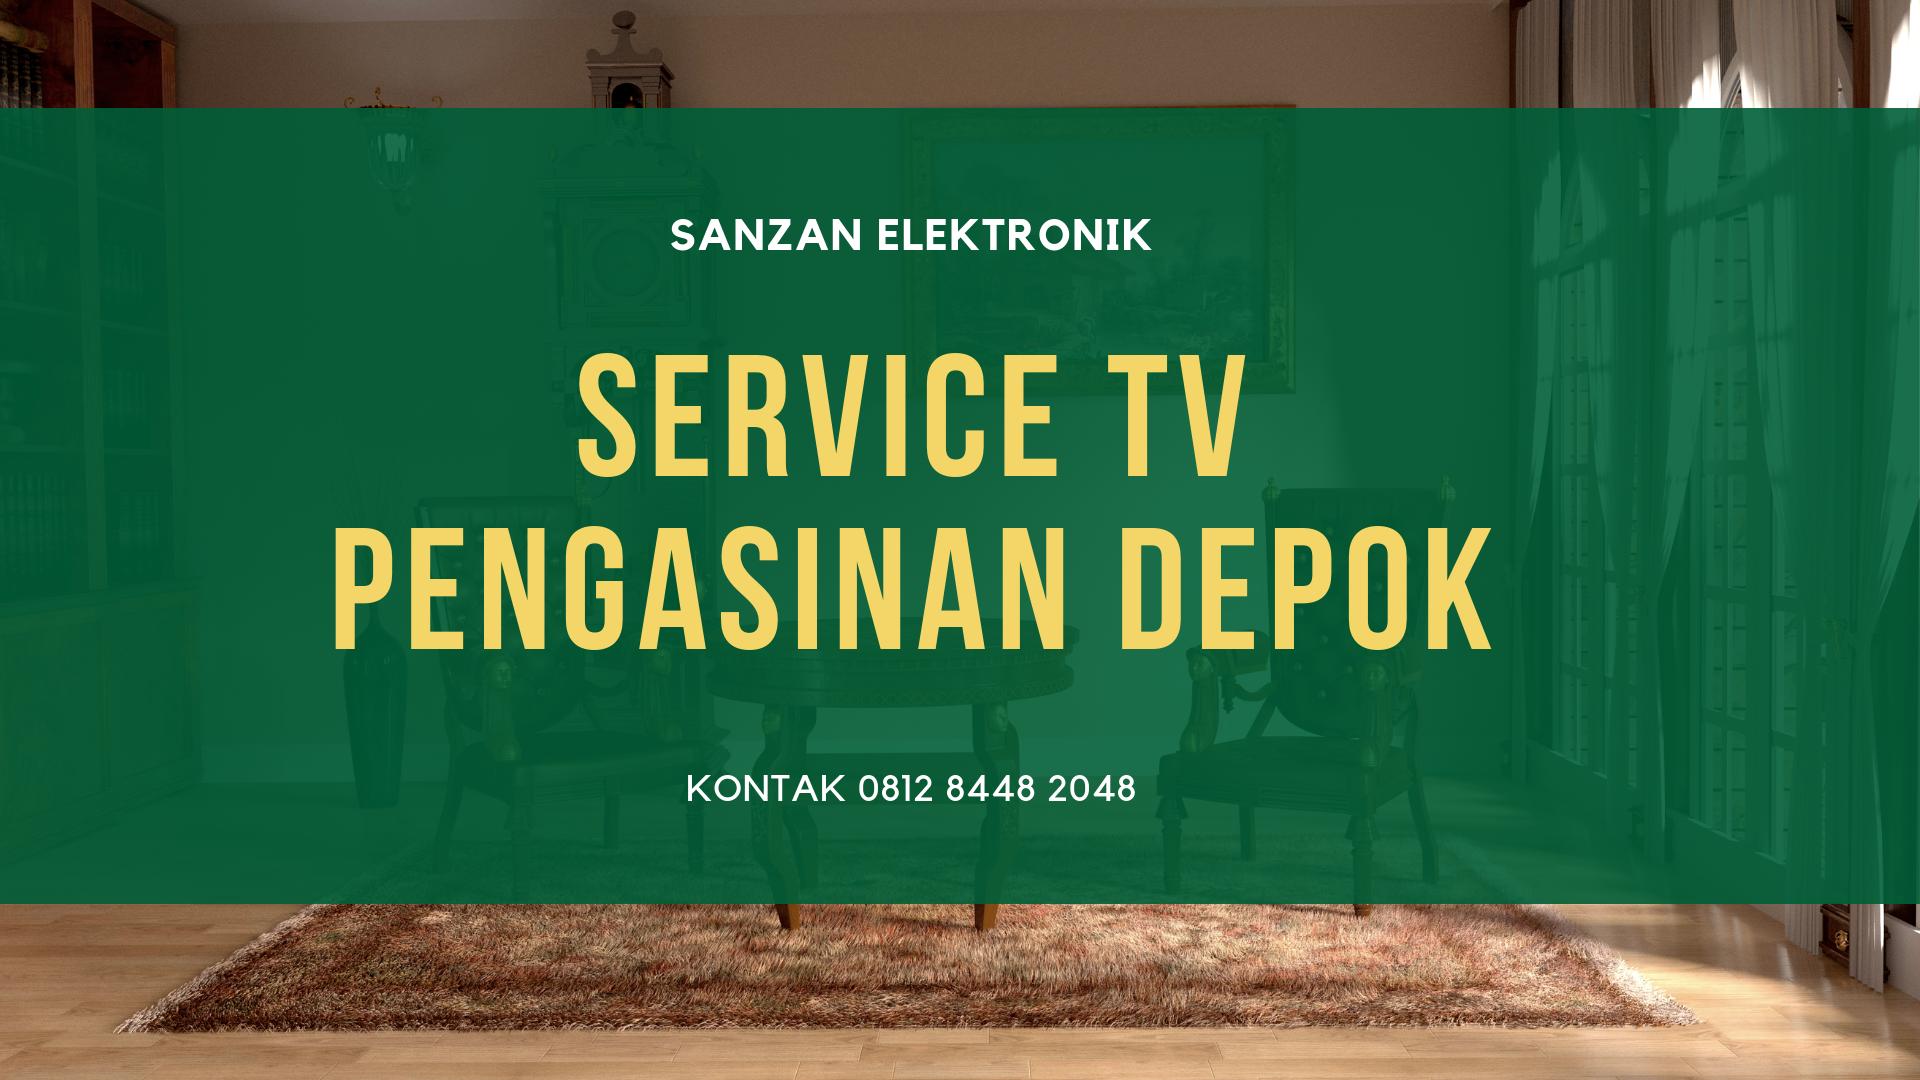 Service TV Pengasinan Depok